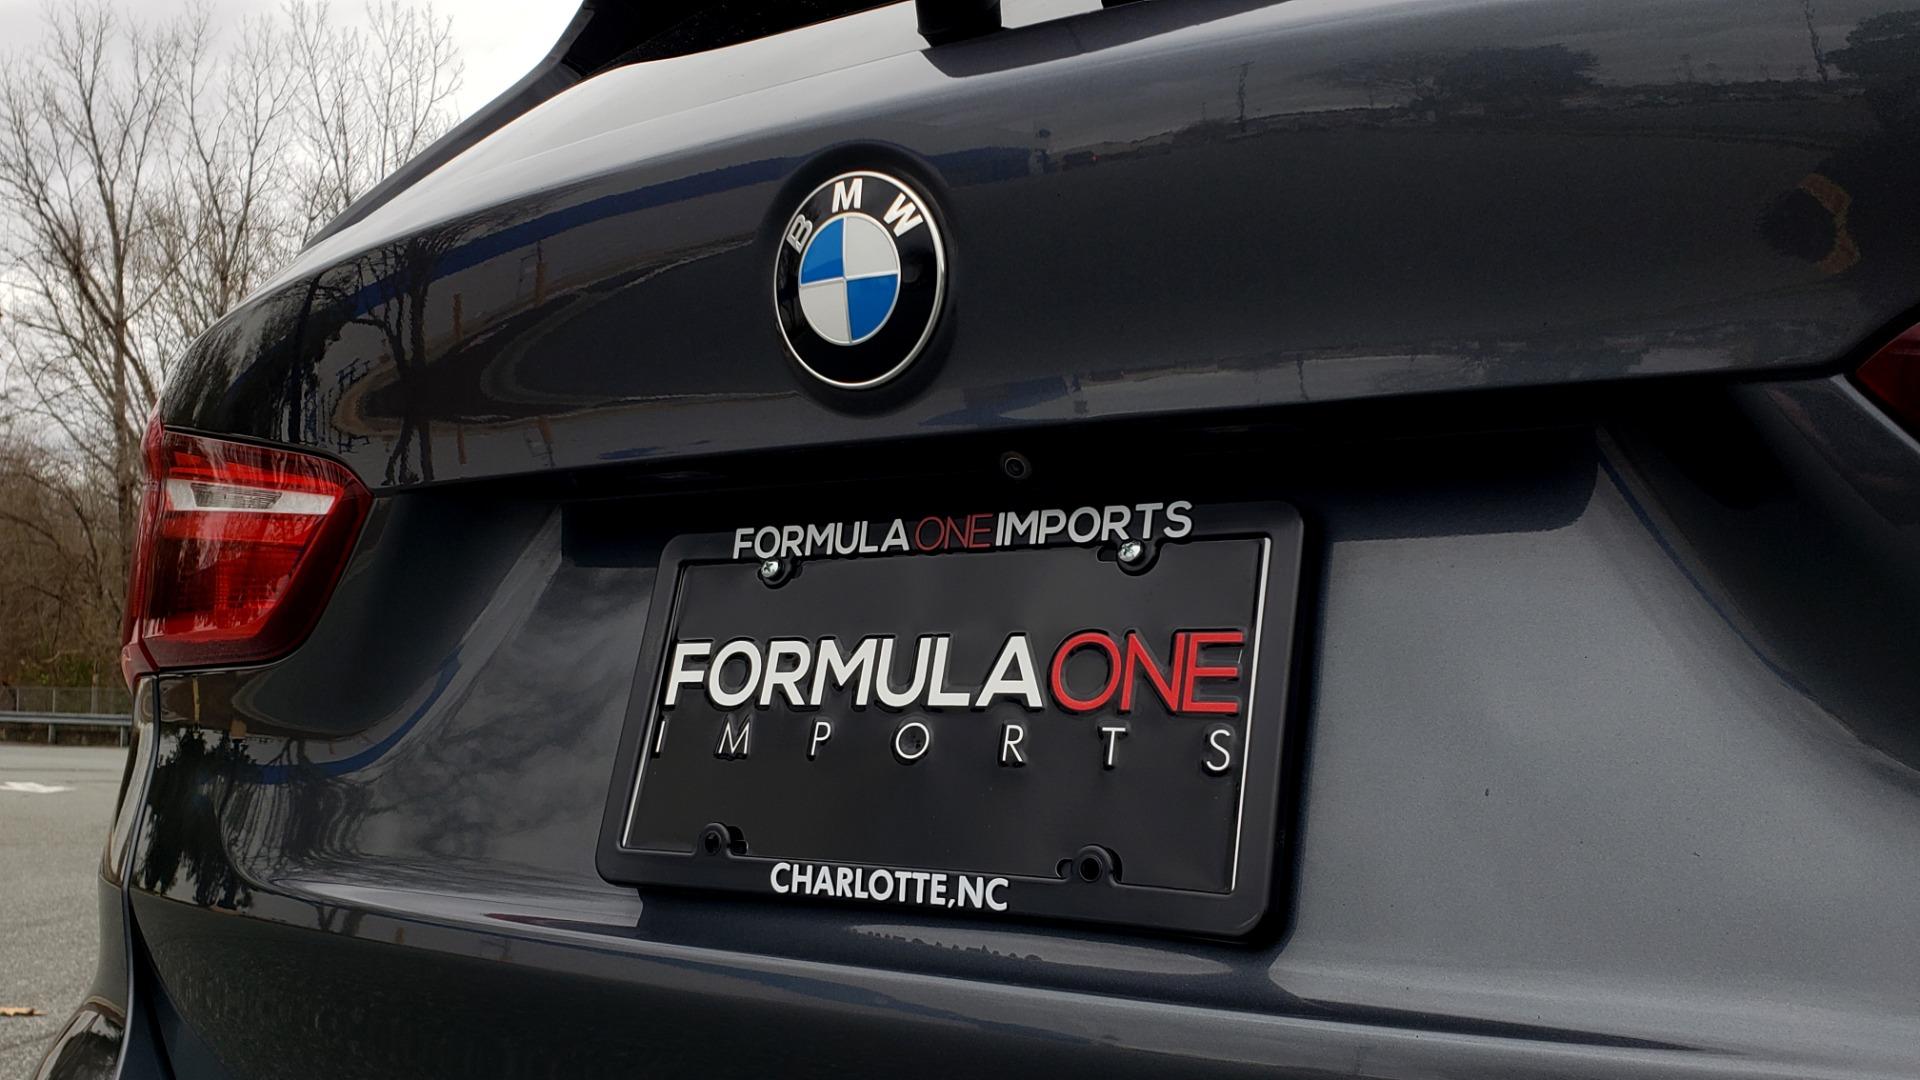 Used 2017 BMW X1 XDRIVE28I / PREM PKG / DRIVER ASST / NAV / CLD WTHR for sale Sold at Formula Imports in Charlotte NC 28227 32